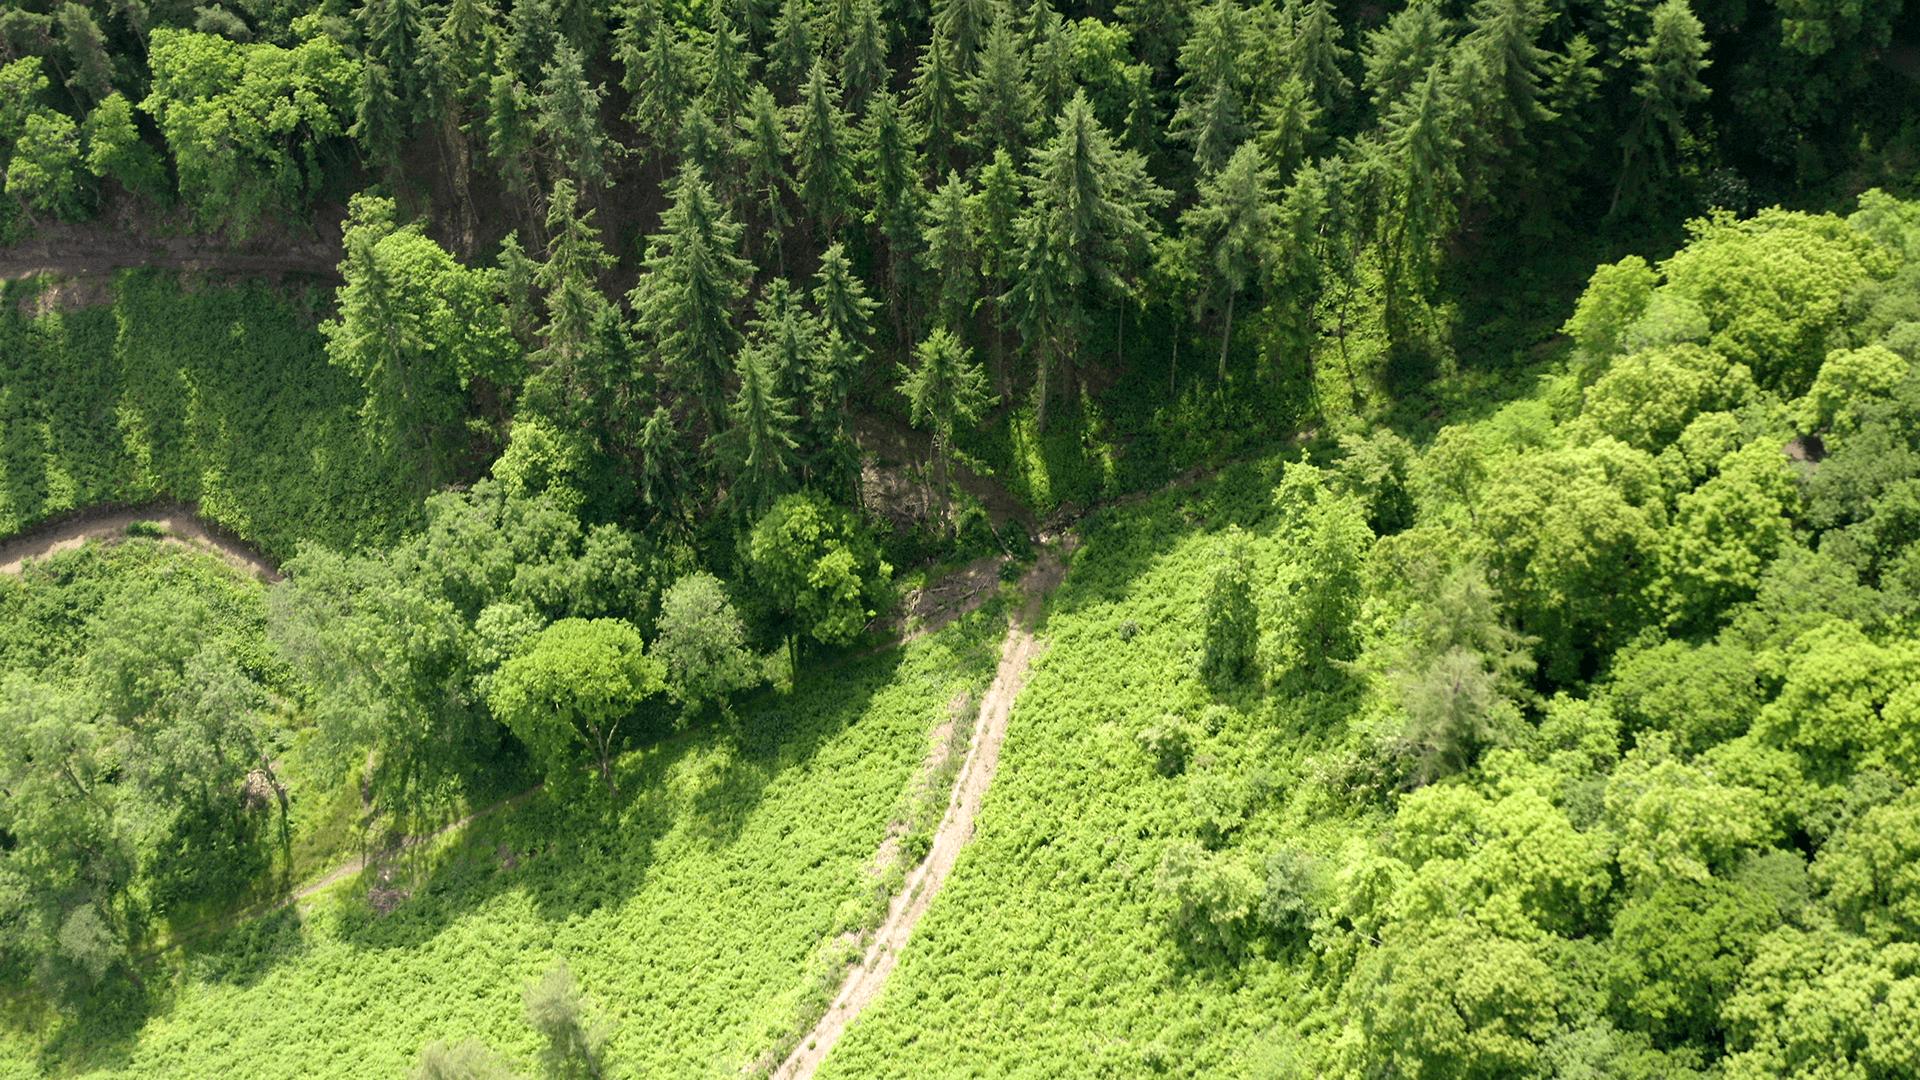 Porlock Weir Aerial Photograph